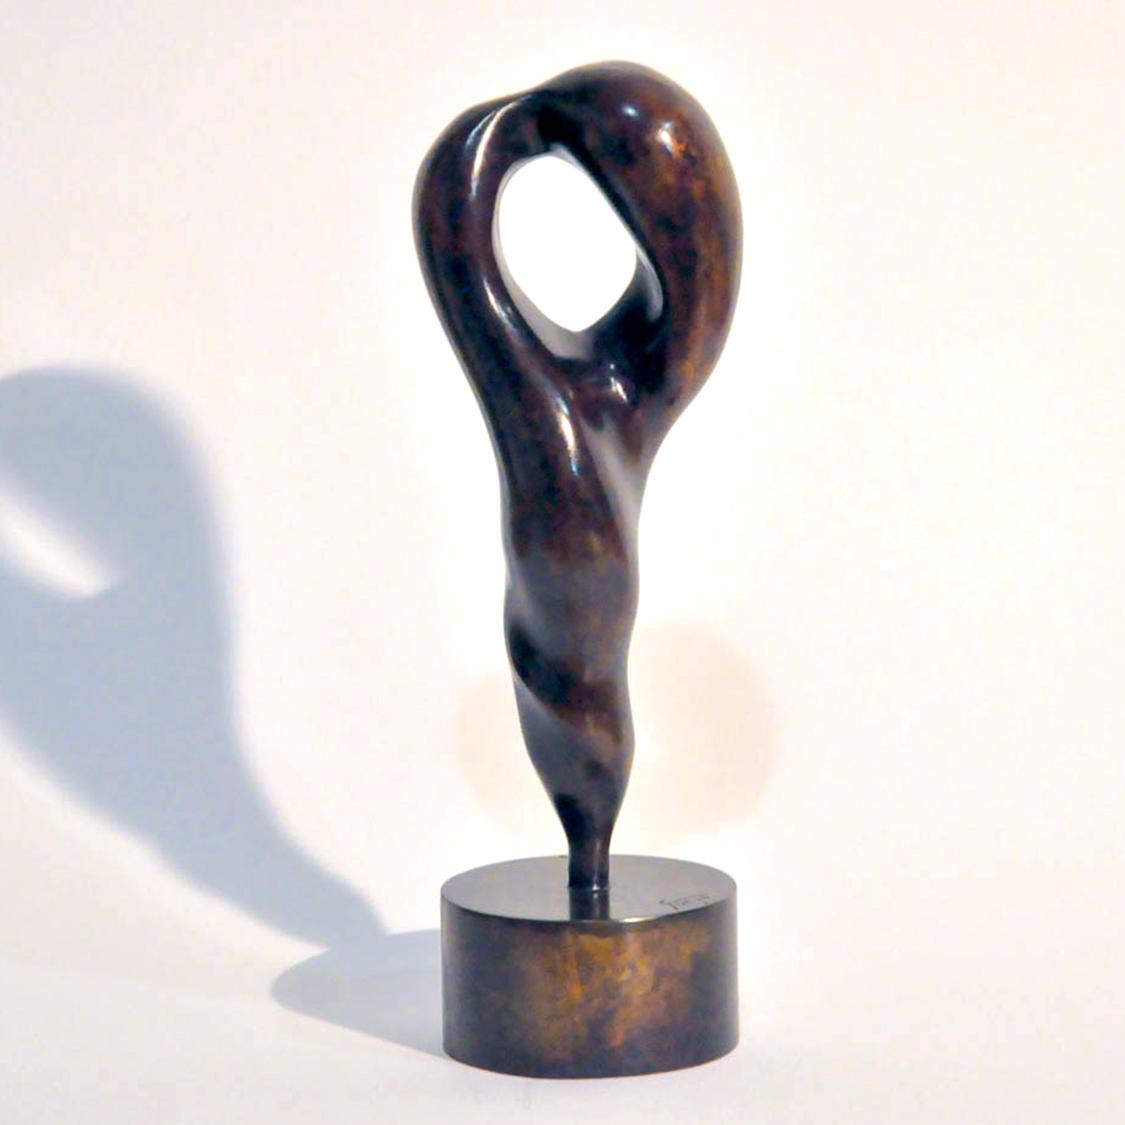 ENSEMBLE-turzo-sculpture--3